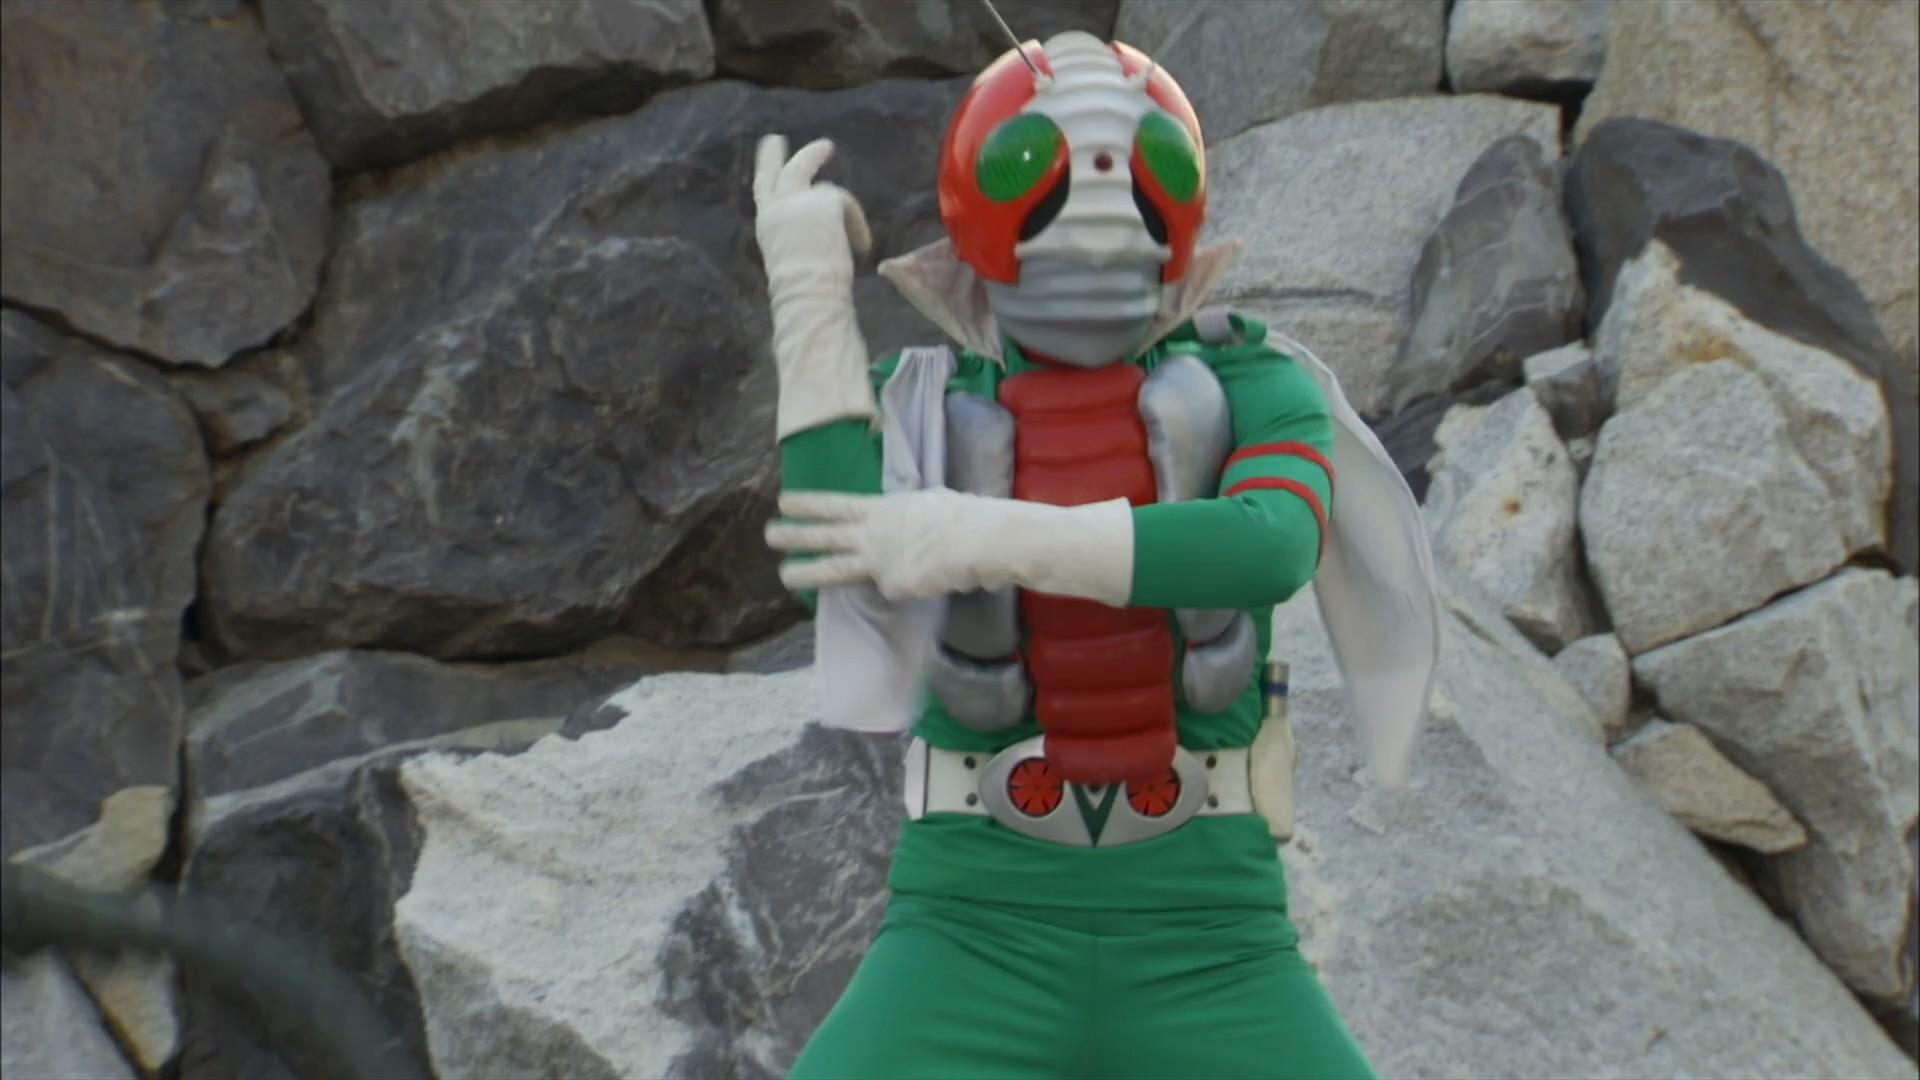 http://vignette4.wikia.nocookie.net/kamenrider/images/1/1c/V3_(Let's_Go_Kamen_Riders).jpg/revision/latest?cb=20120613163346